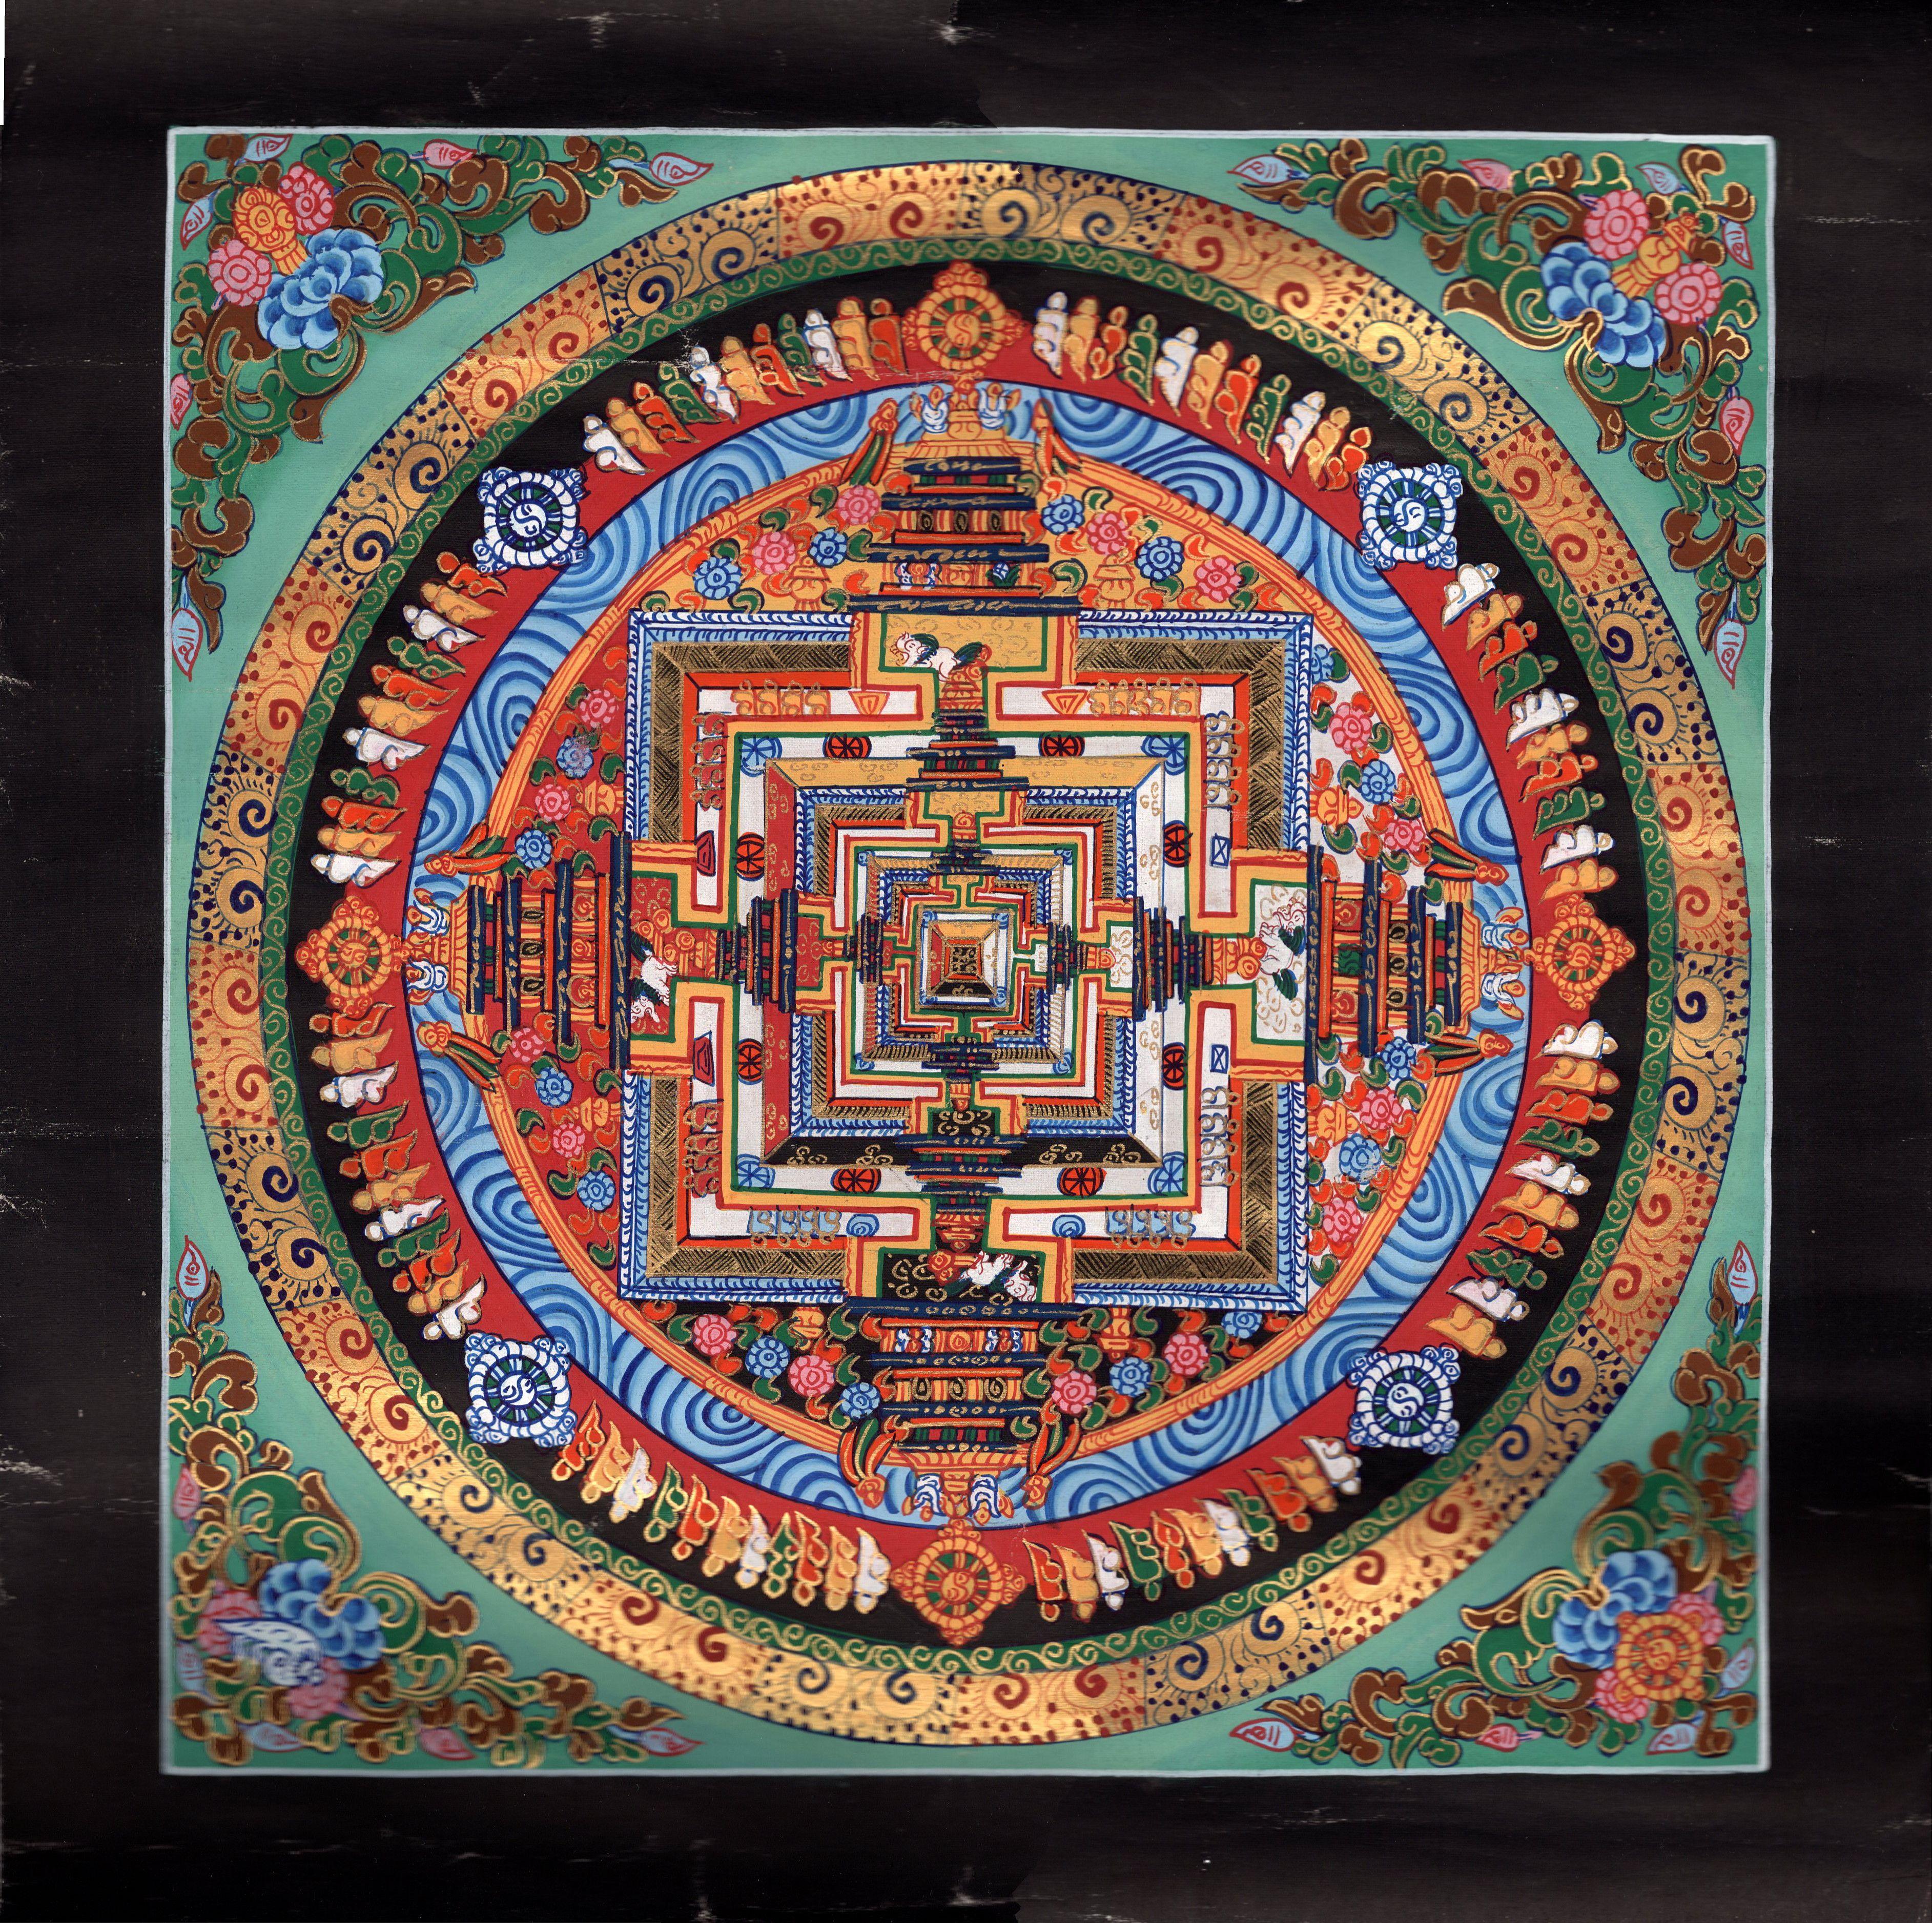 Kalachakra Mandala Painting Handmade Tibetan Thangka